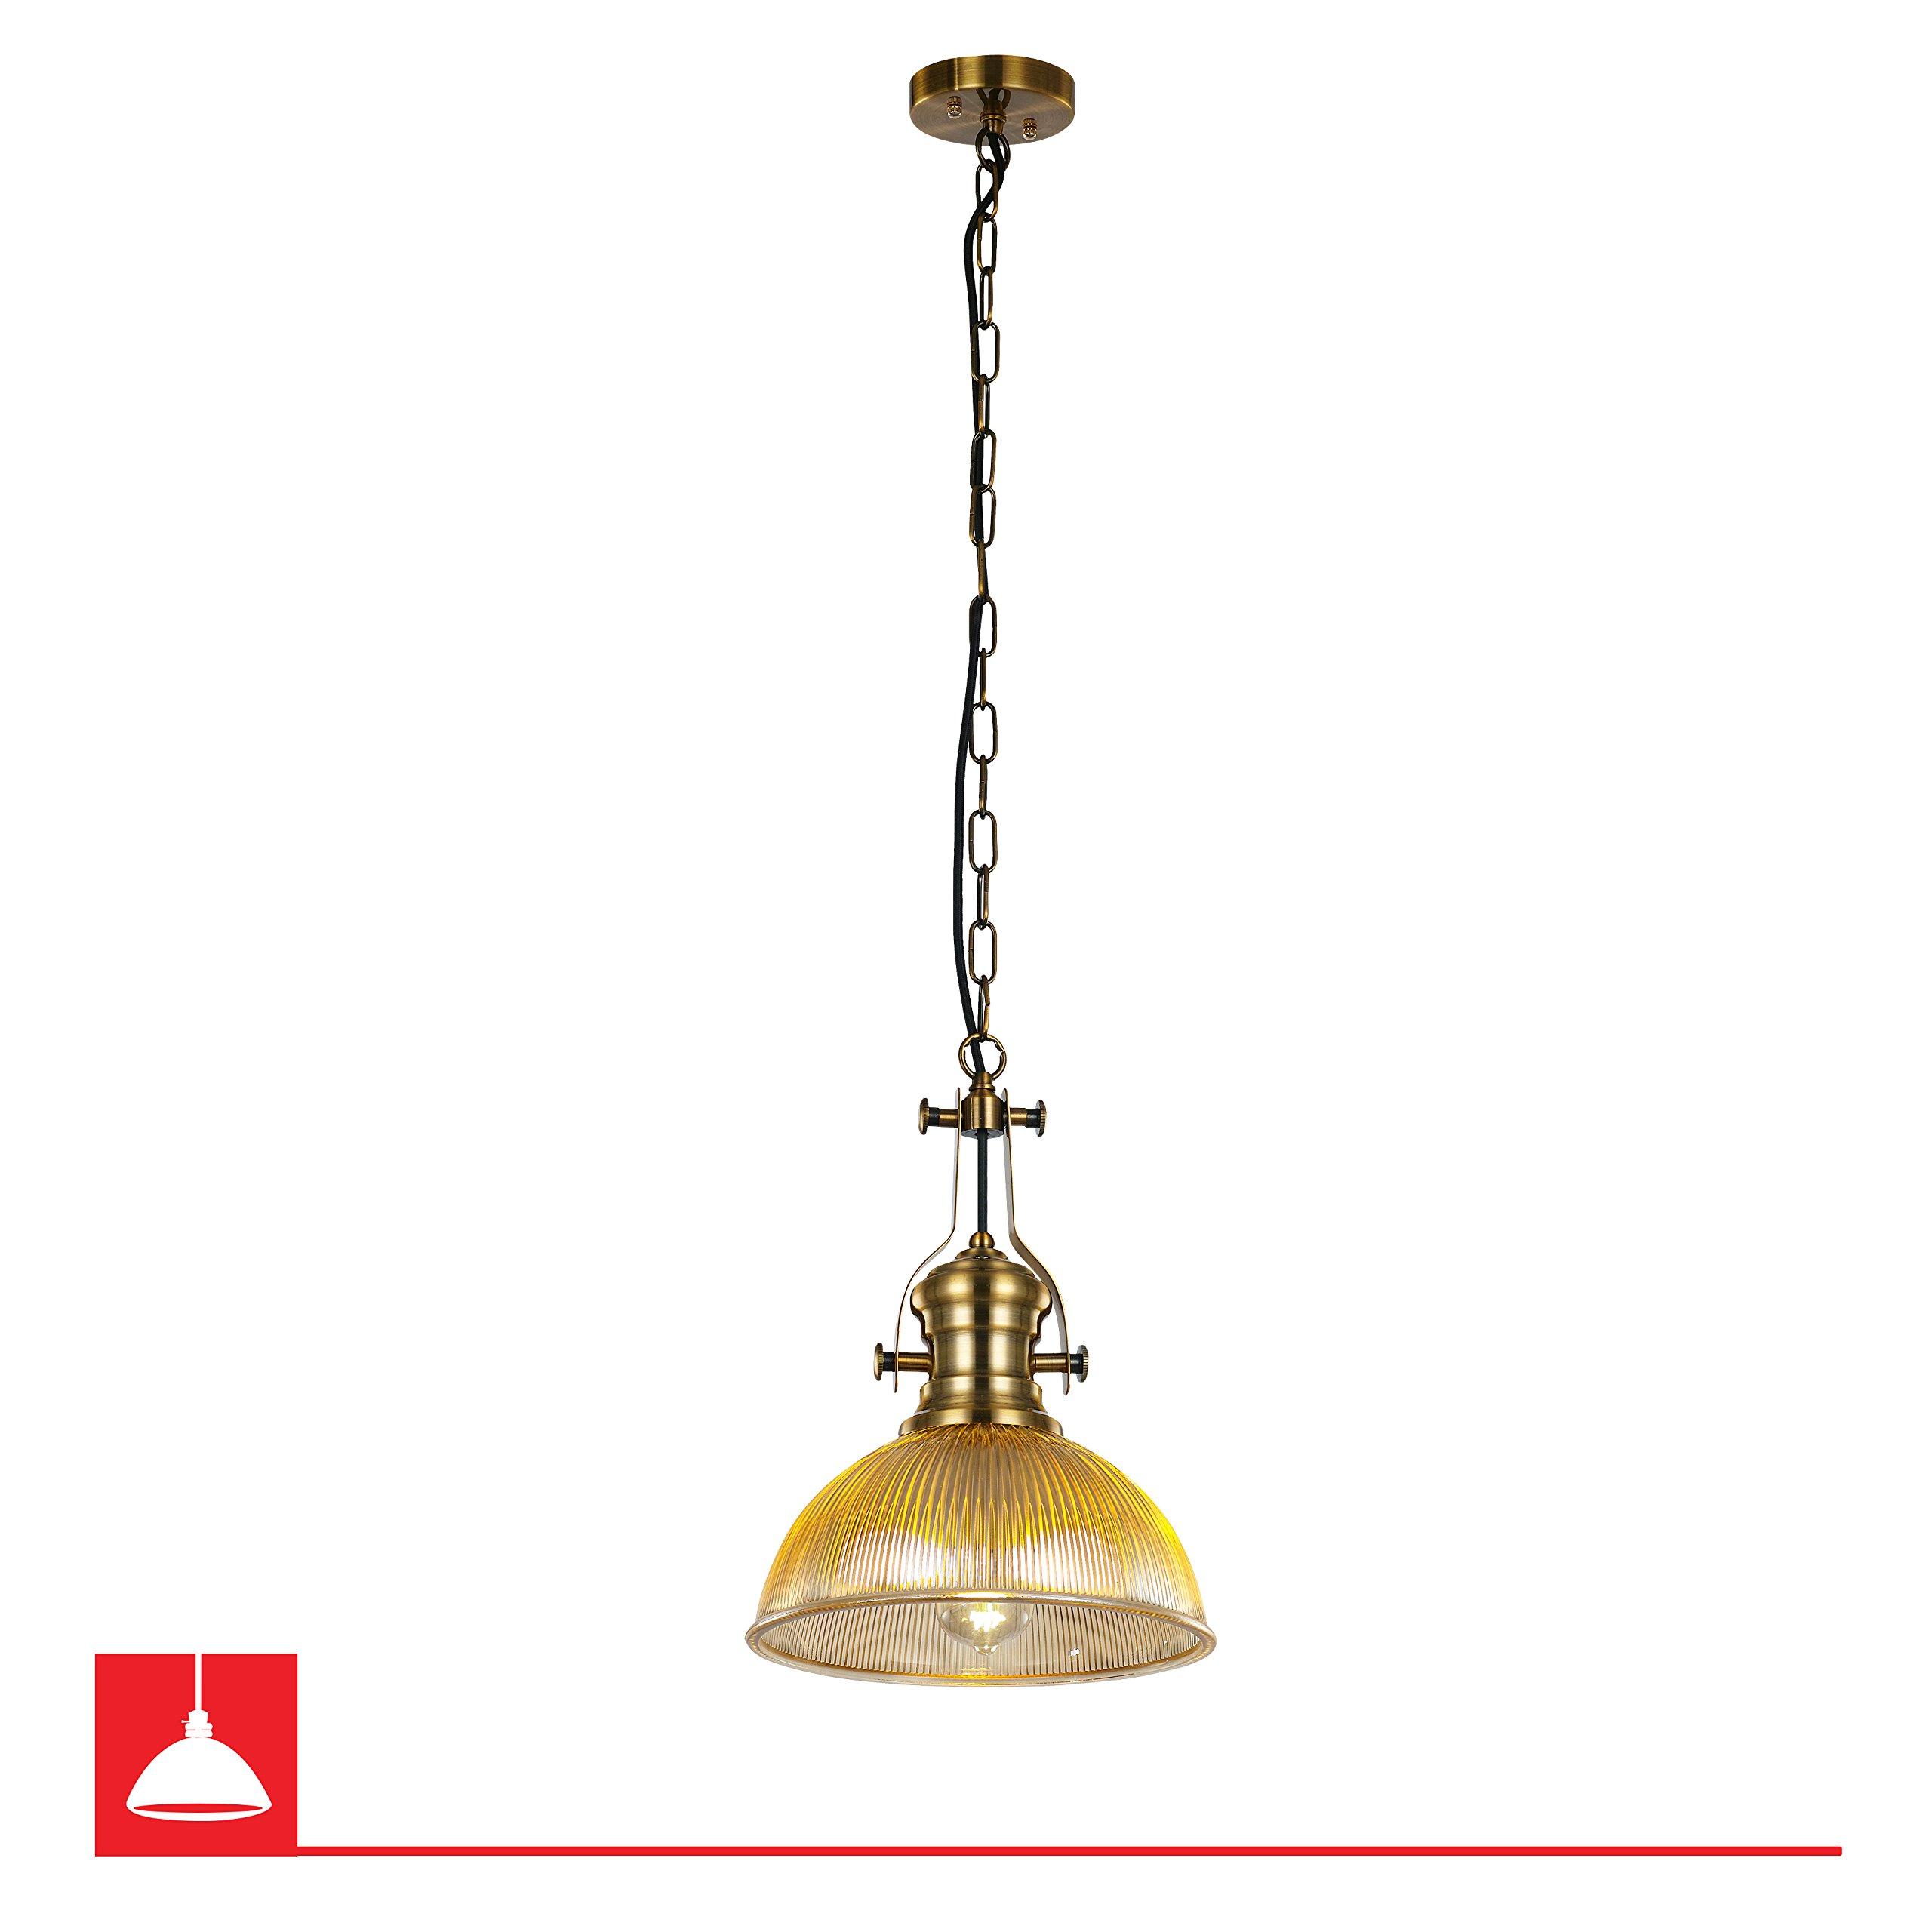 Prattville Single Bulb Amber Glass Pendant Light Fixture – Antique Brass